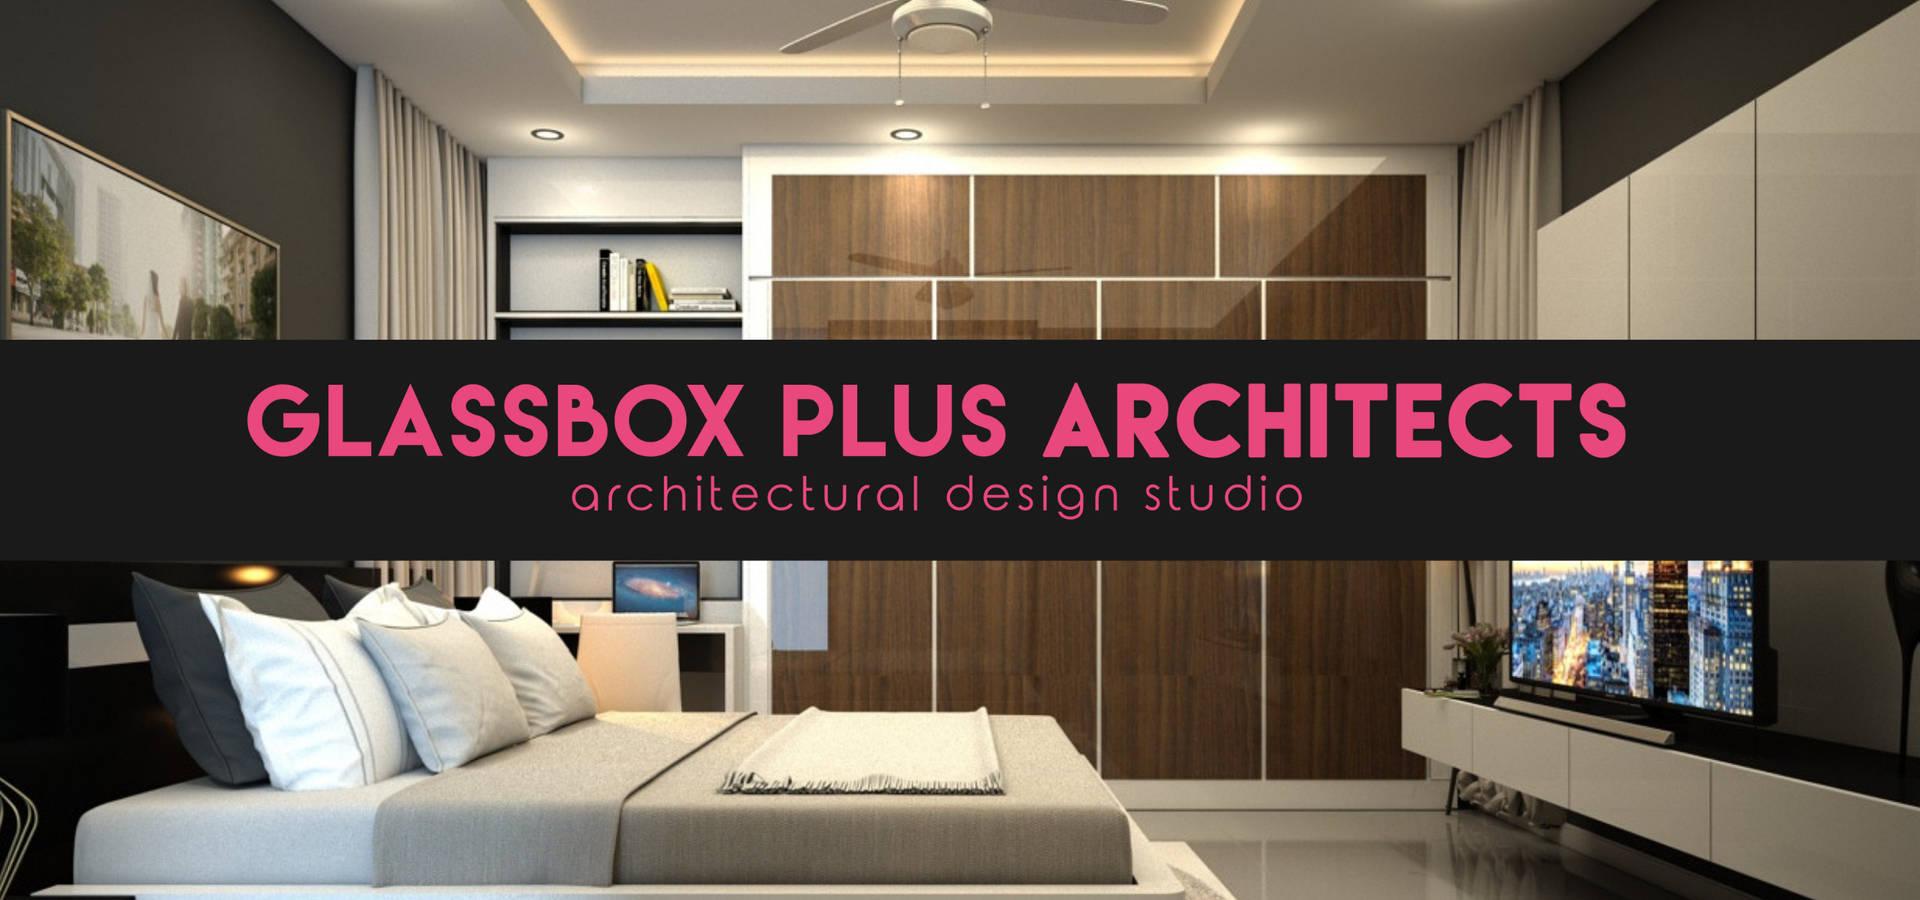 Glassbox Plus Architects